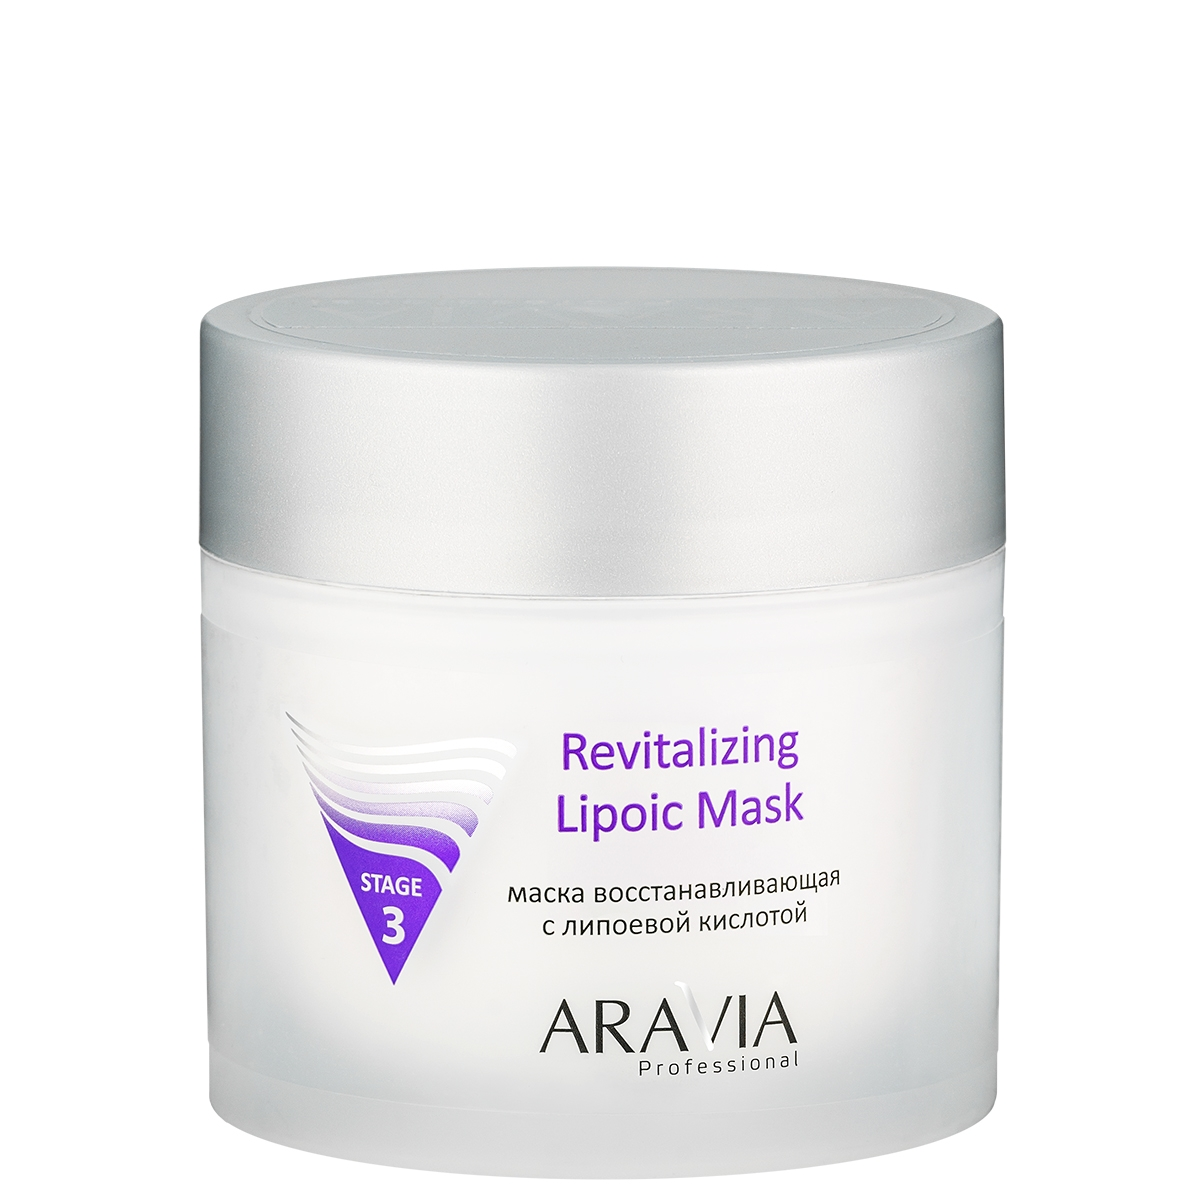 ARAVIA Маска восстанавливающая с липоевой кислотой Revitalizing Lipoic Mask, 300 мл недорого